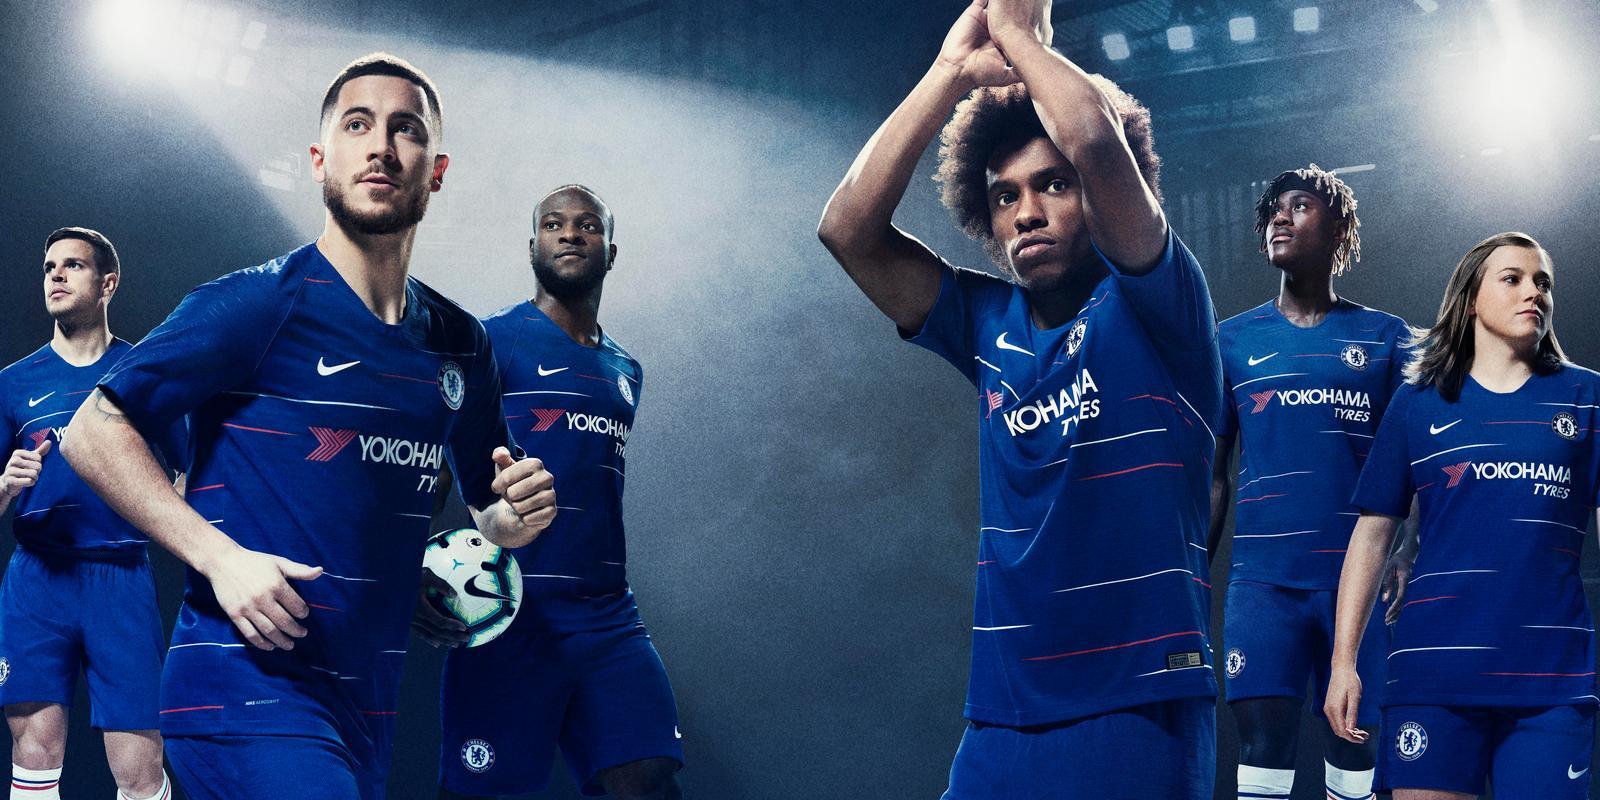 Новая домашняя форма Челси 2018 2019